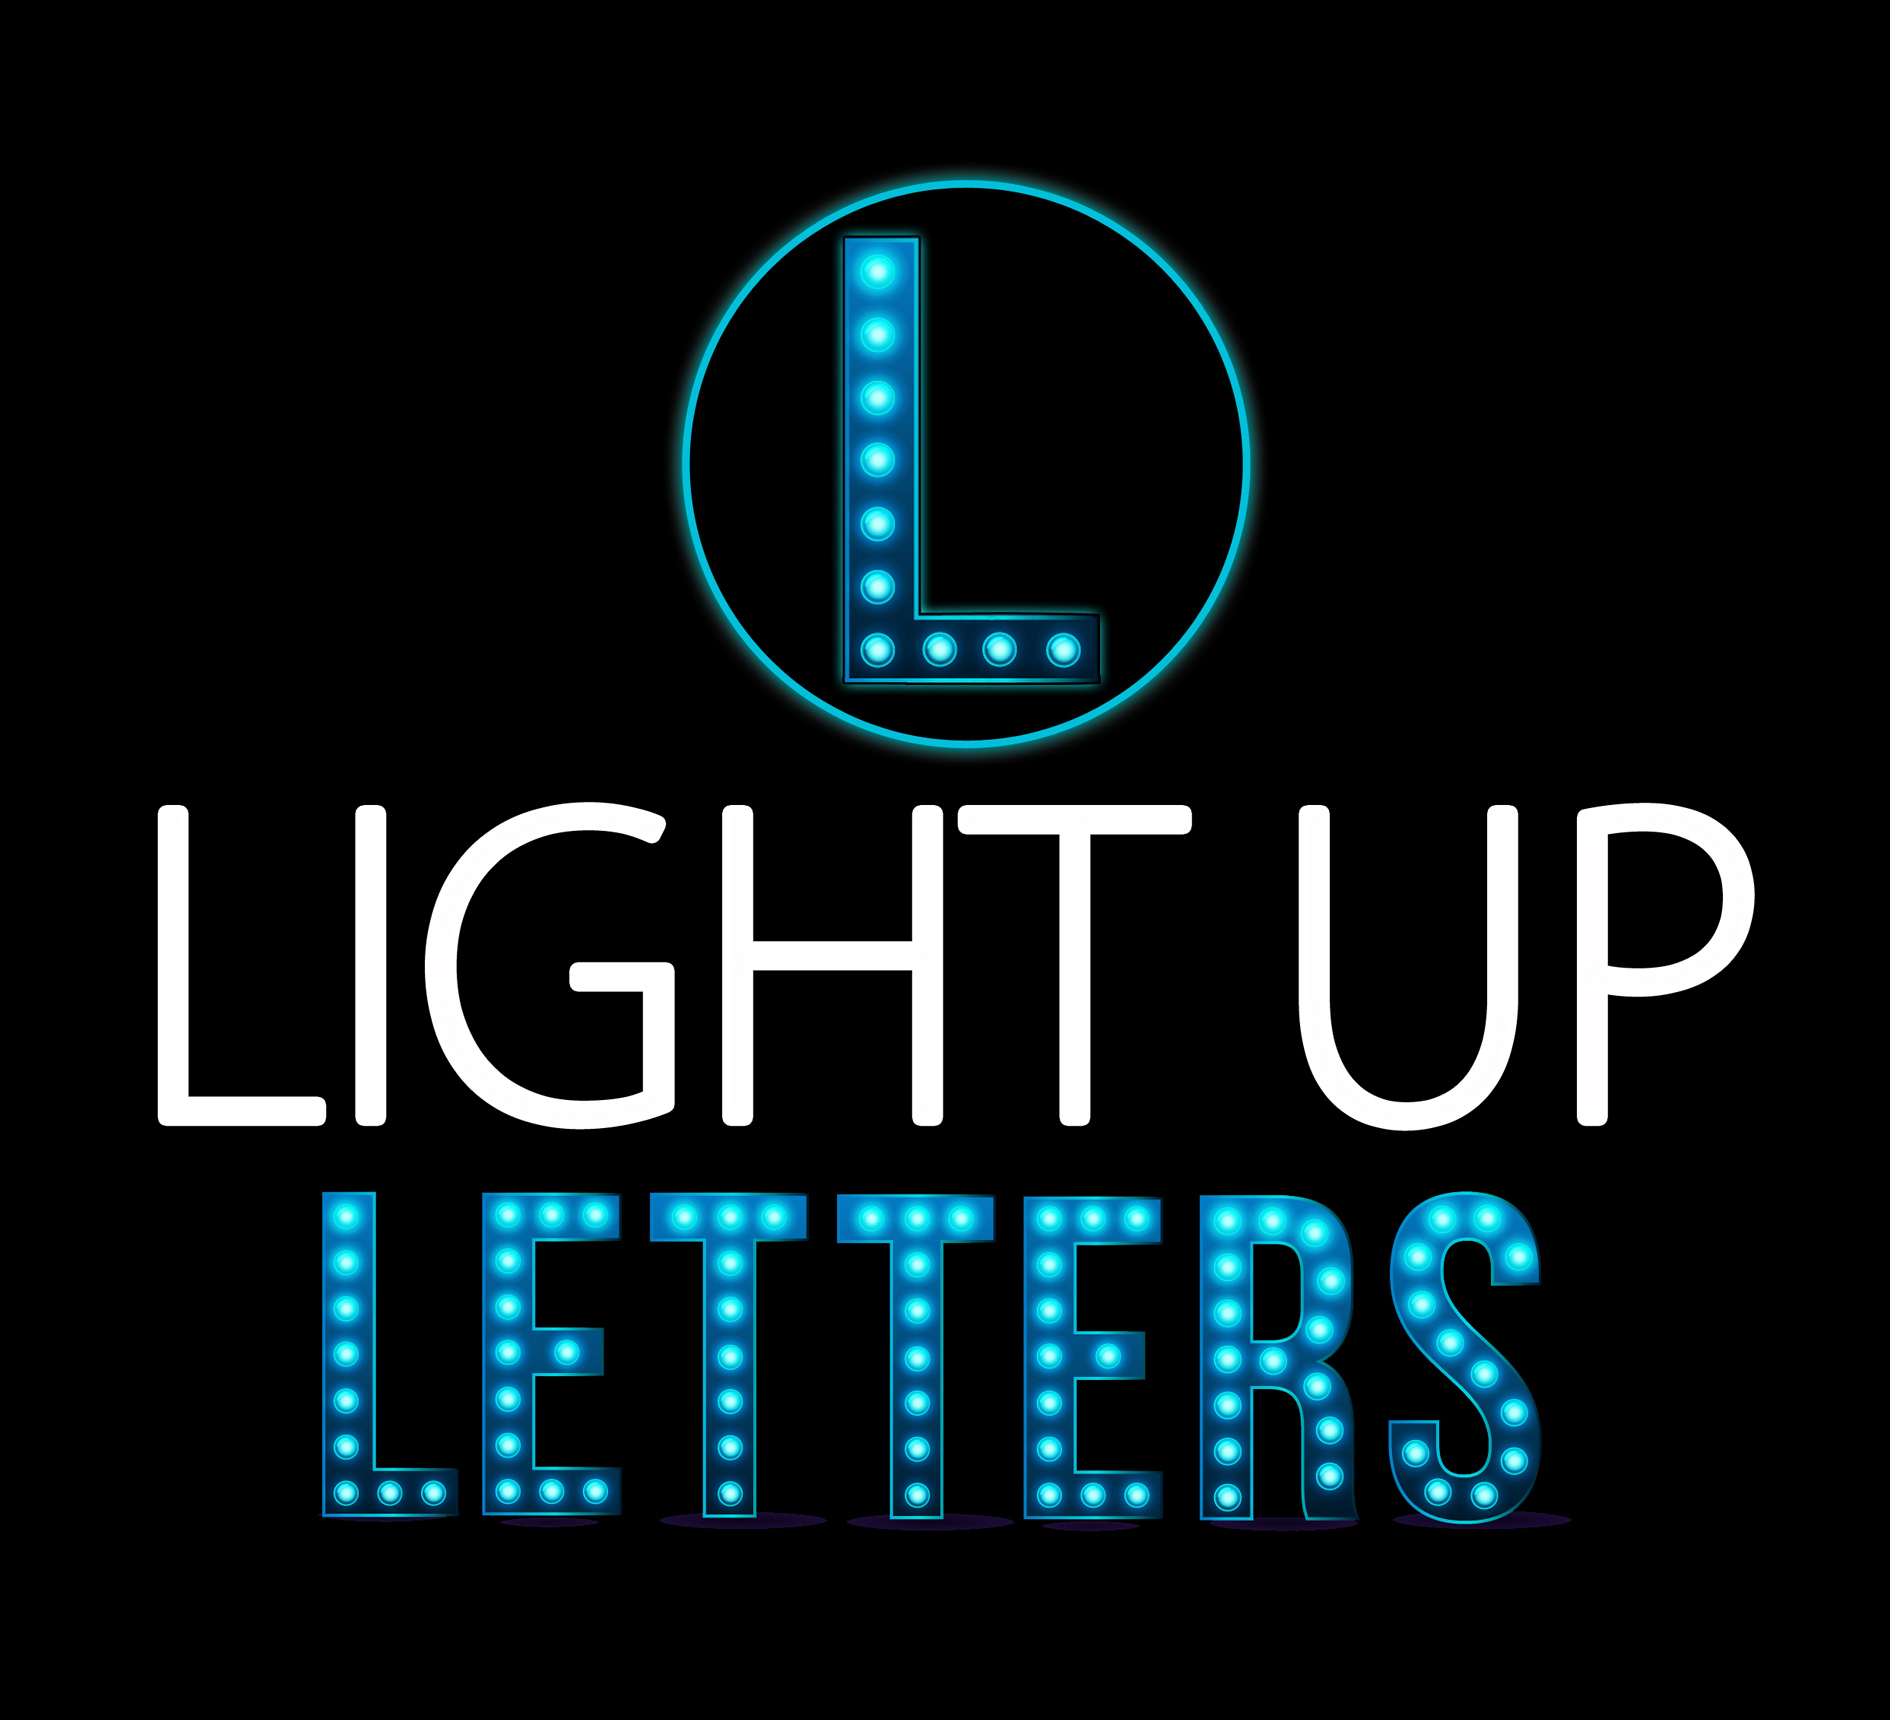 Light Up Letter Bali Wedding Event Rentals In Bali